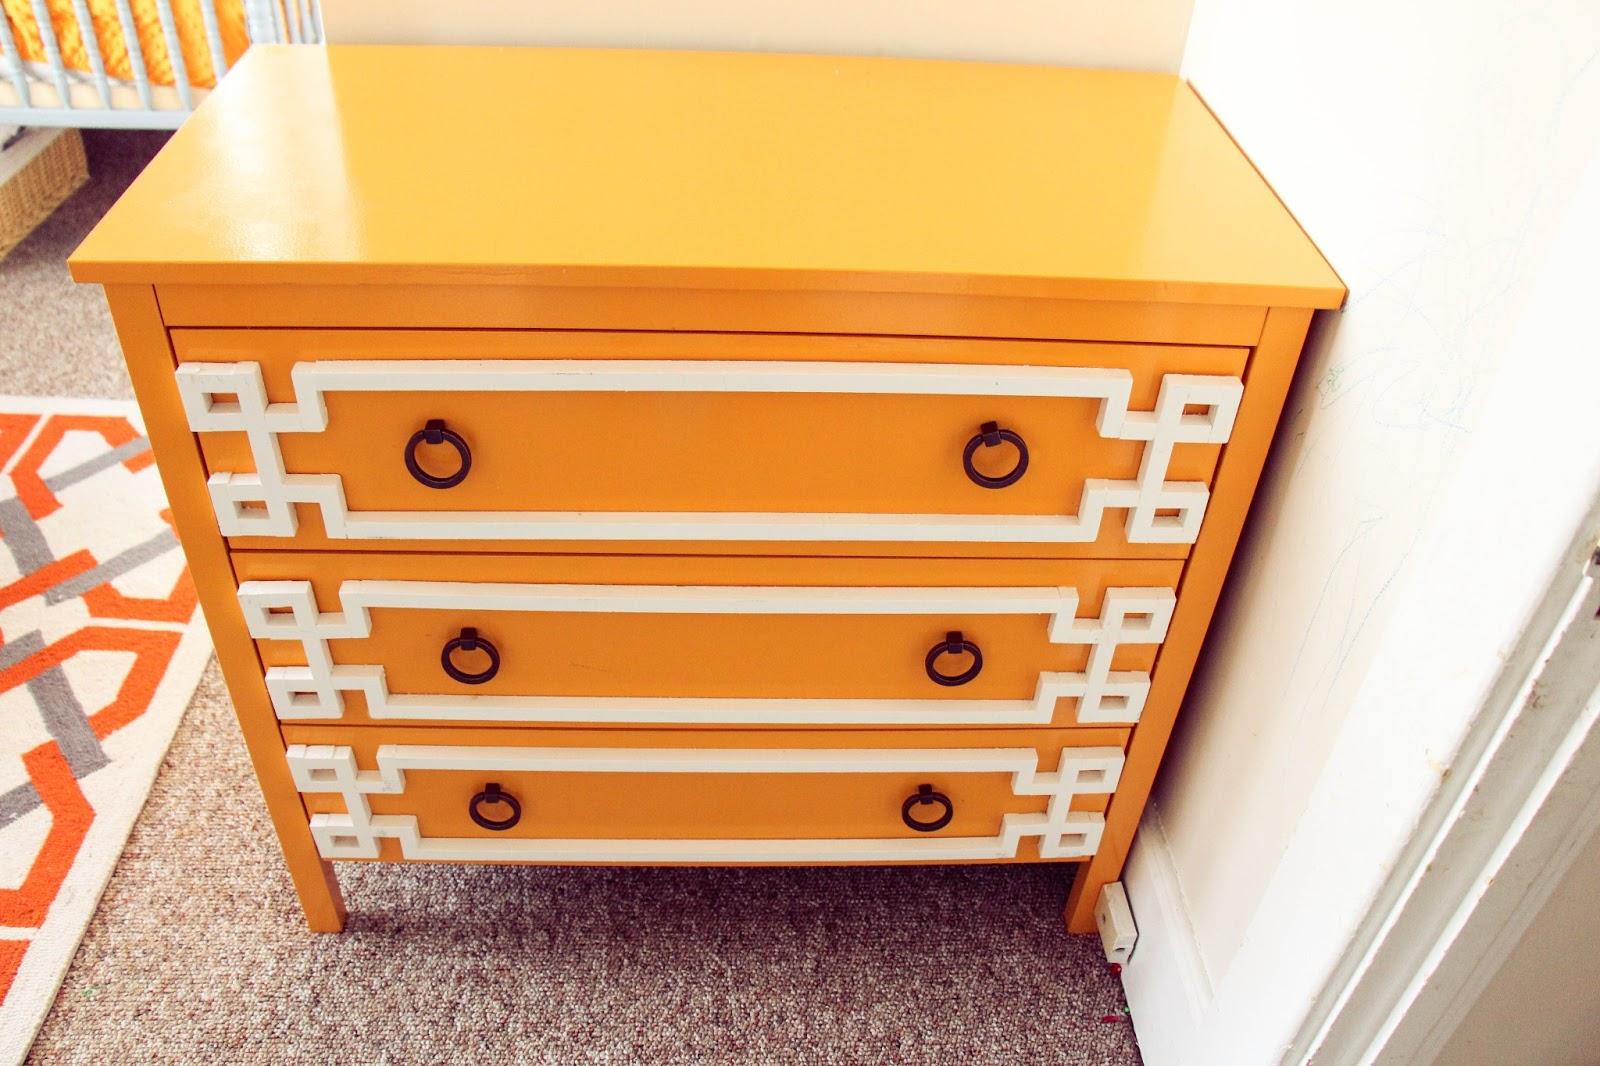 Delightful DIY Dresser Overlay. March 29, 2013